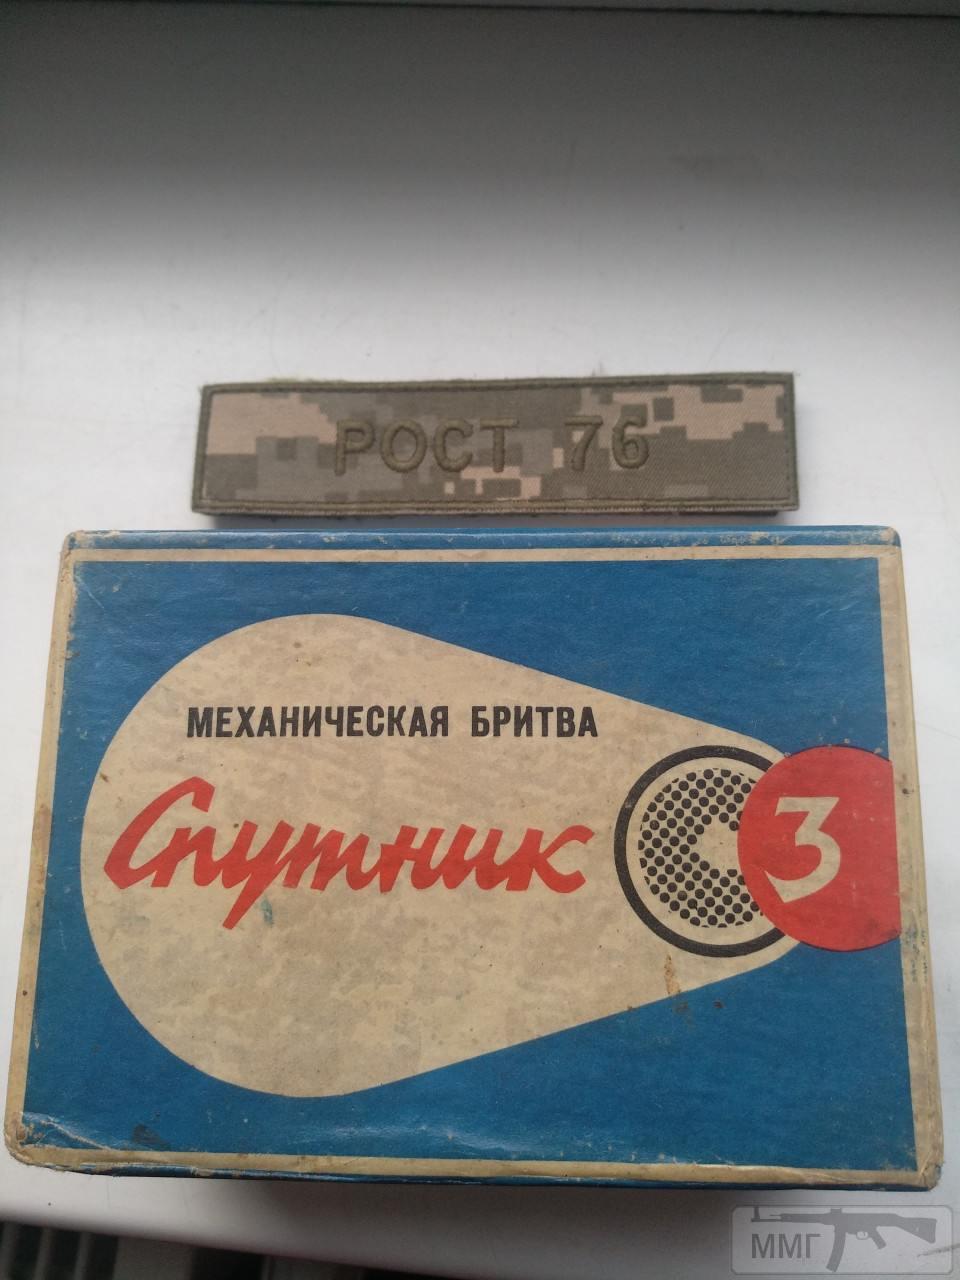 87768 - Механічна бритва ,,Спутник,,